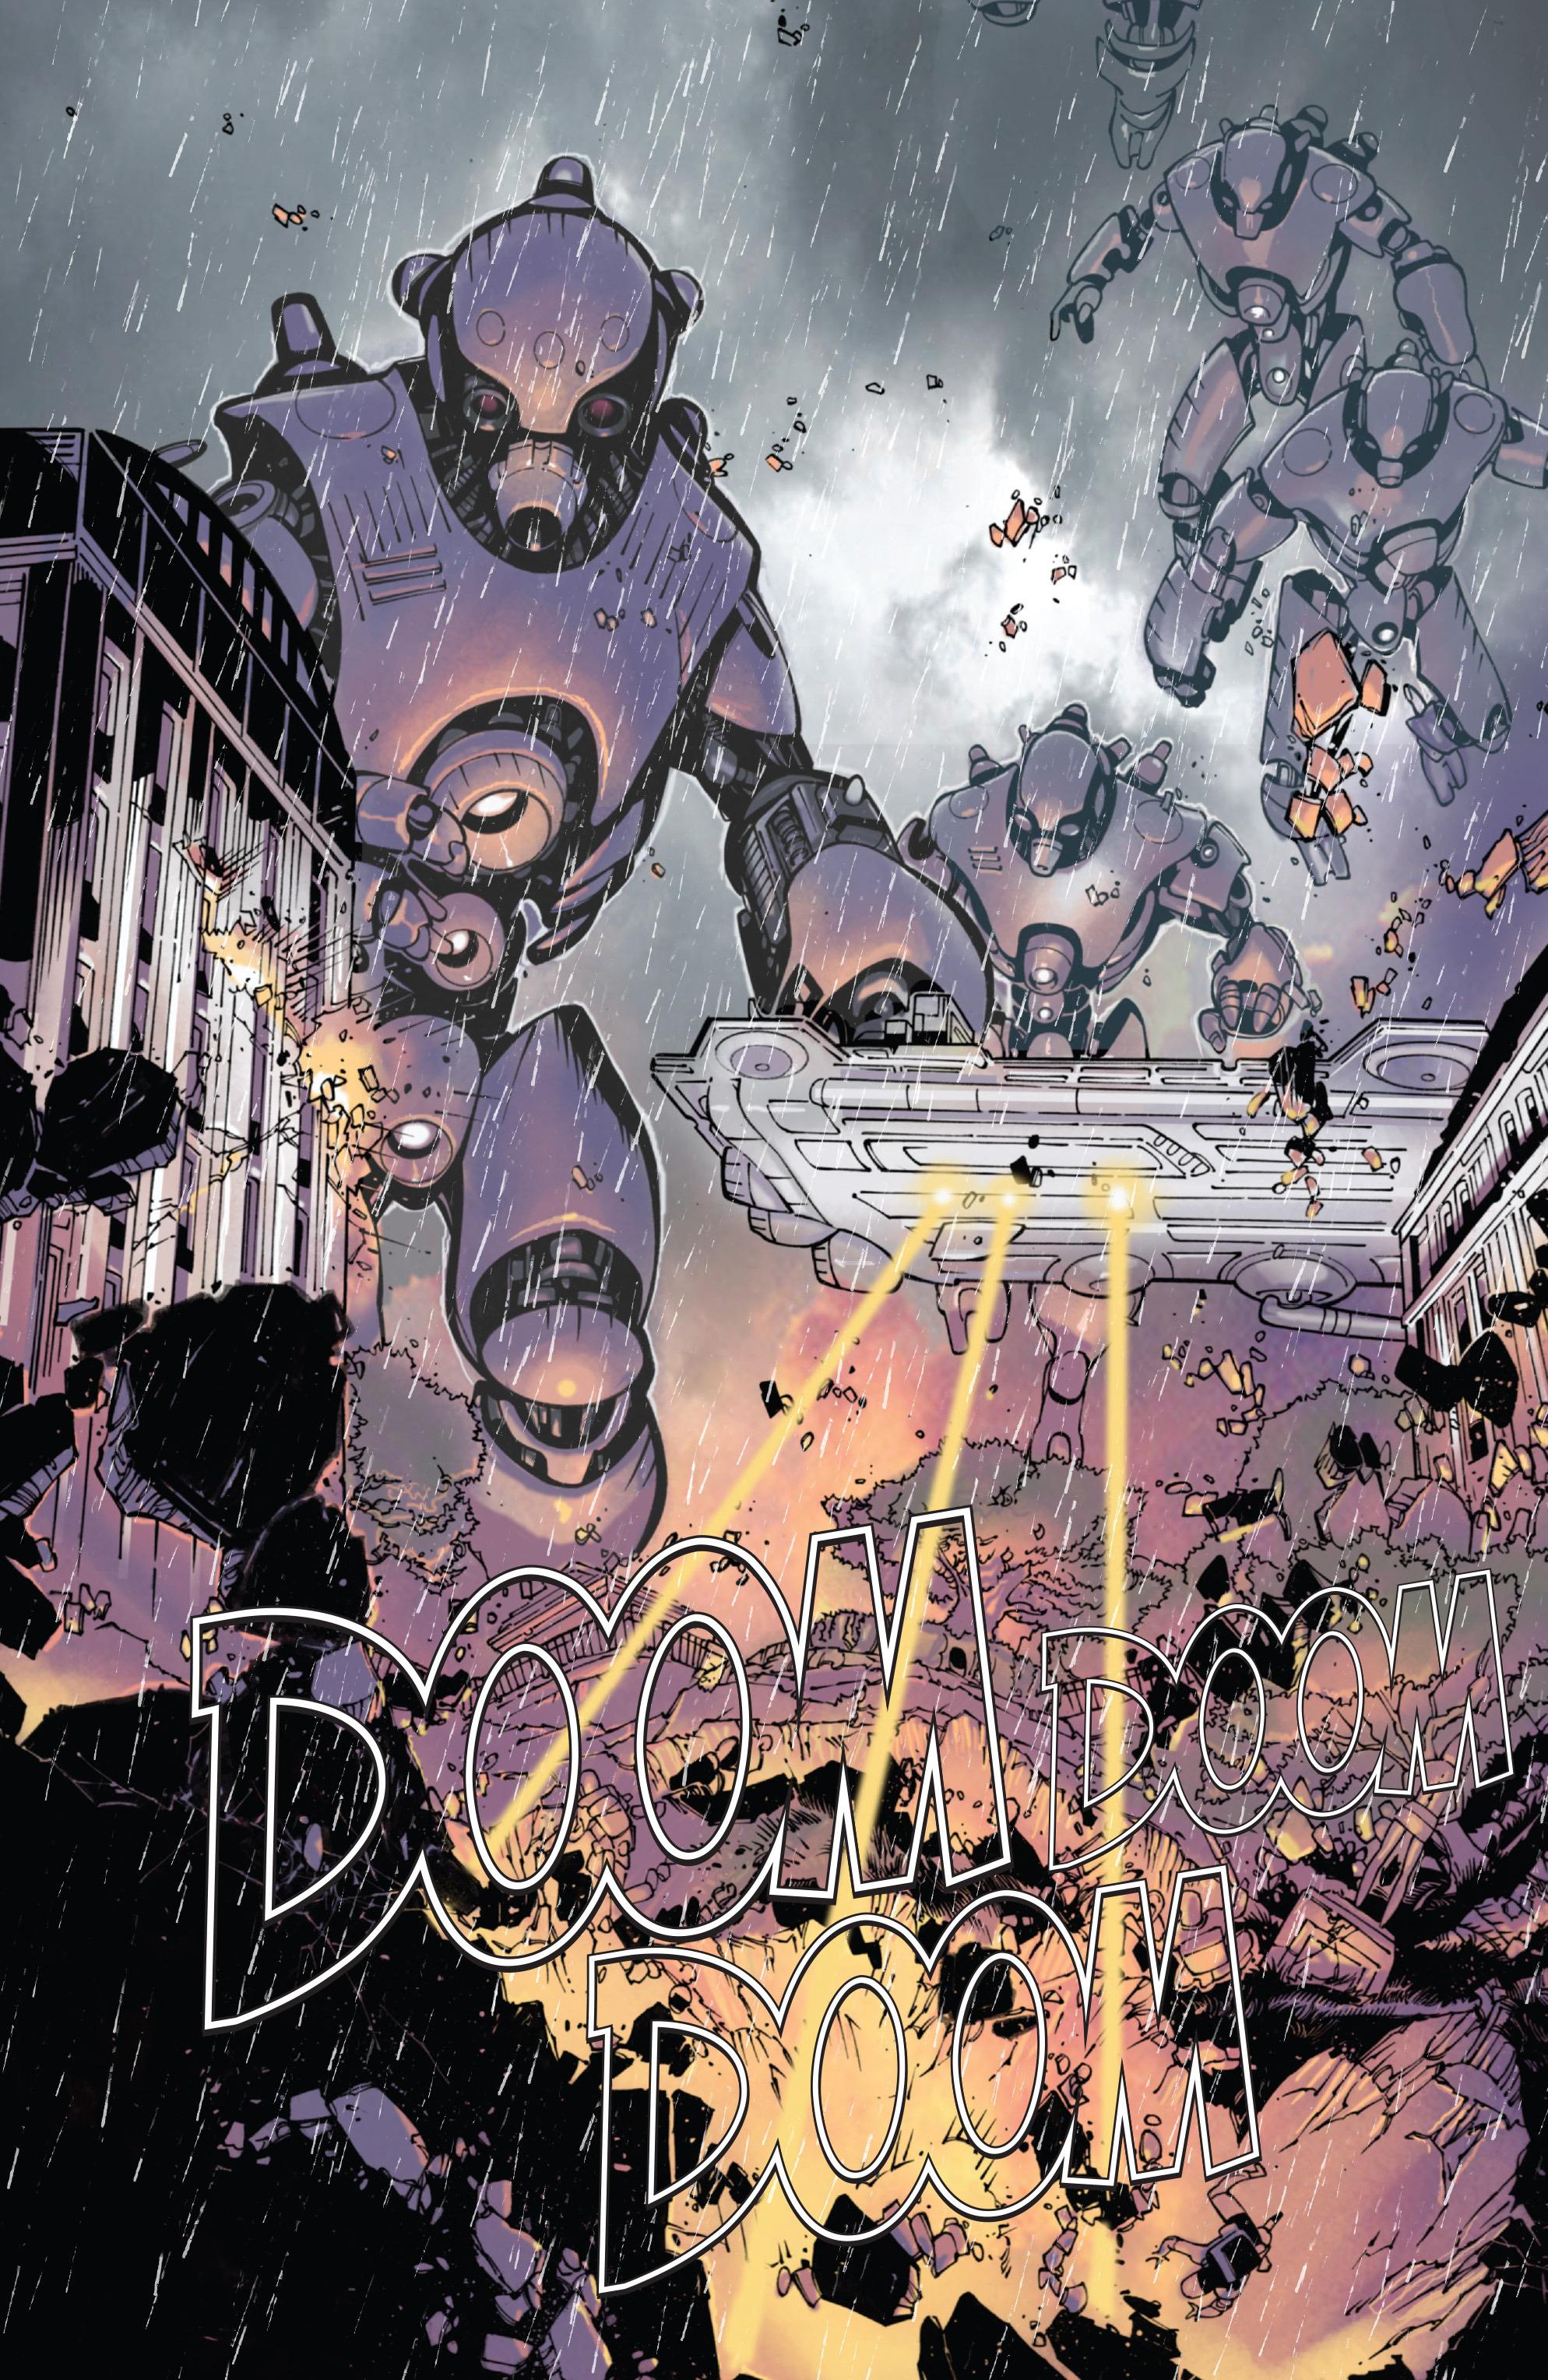 Read online Uncanny X-Men (2013) comic -  Issue # _TPB 4 - vs. S.H.I.E.L.D - 68